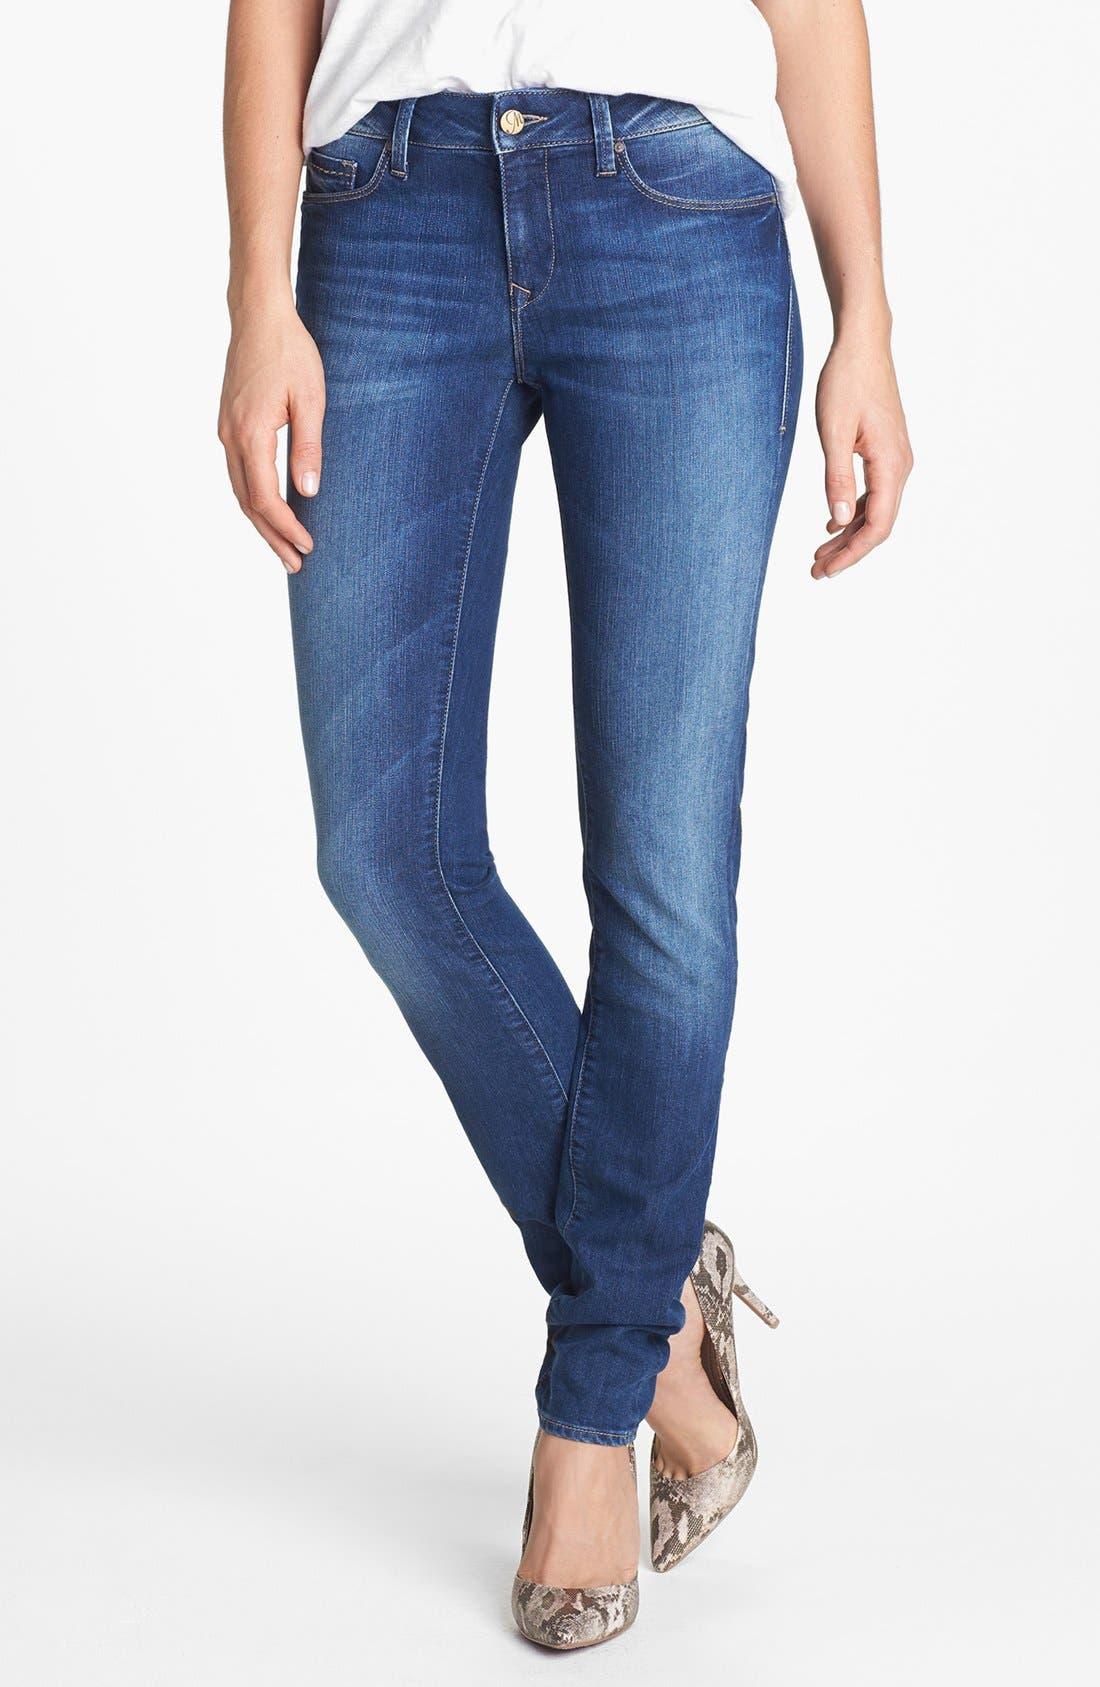 Alternate Image 1 Selected - Mavi Jeans 'Alexa' Mid Rise Skinny Jeans (Mid Indigo Nolita)